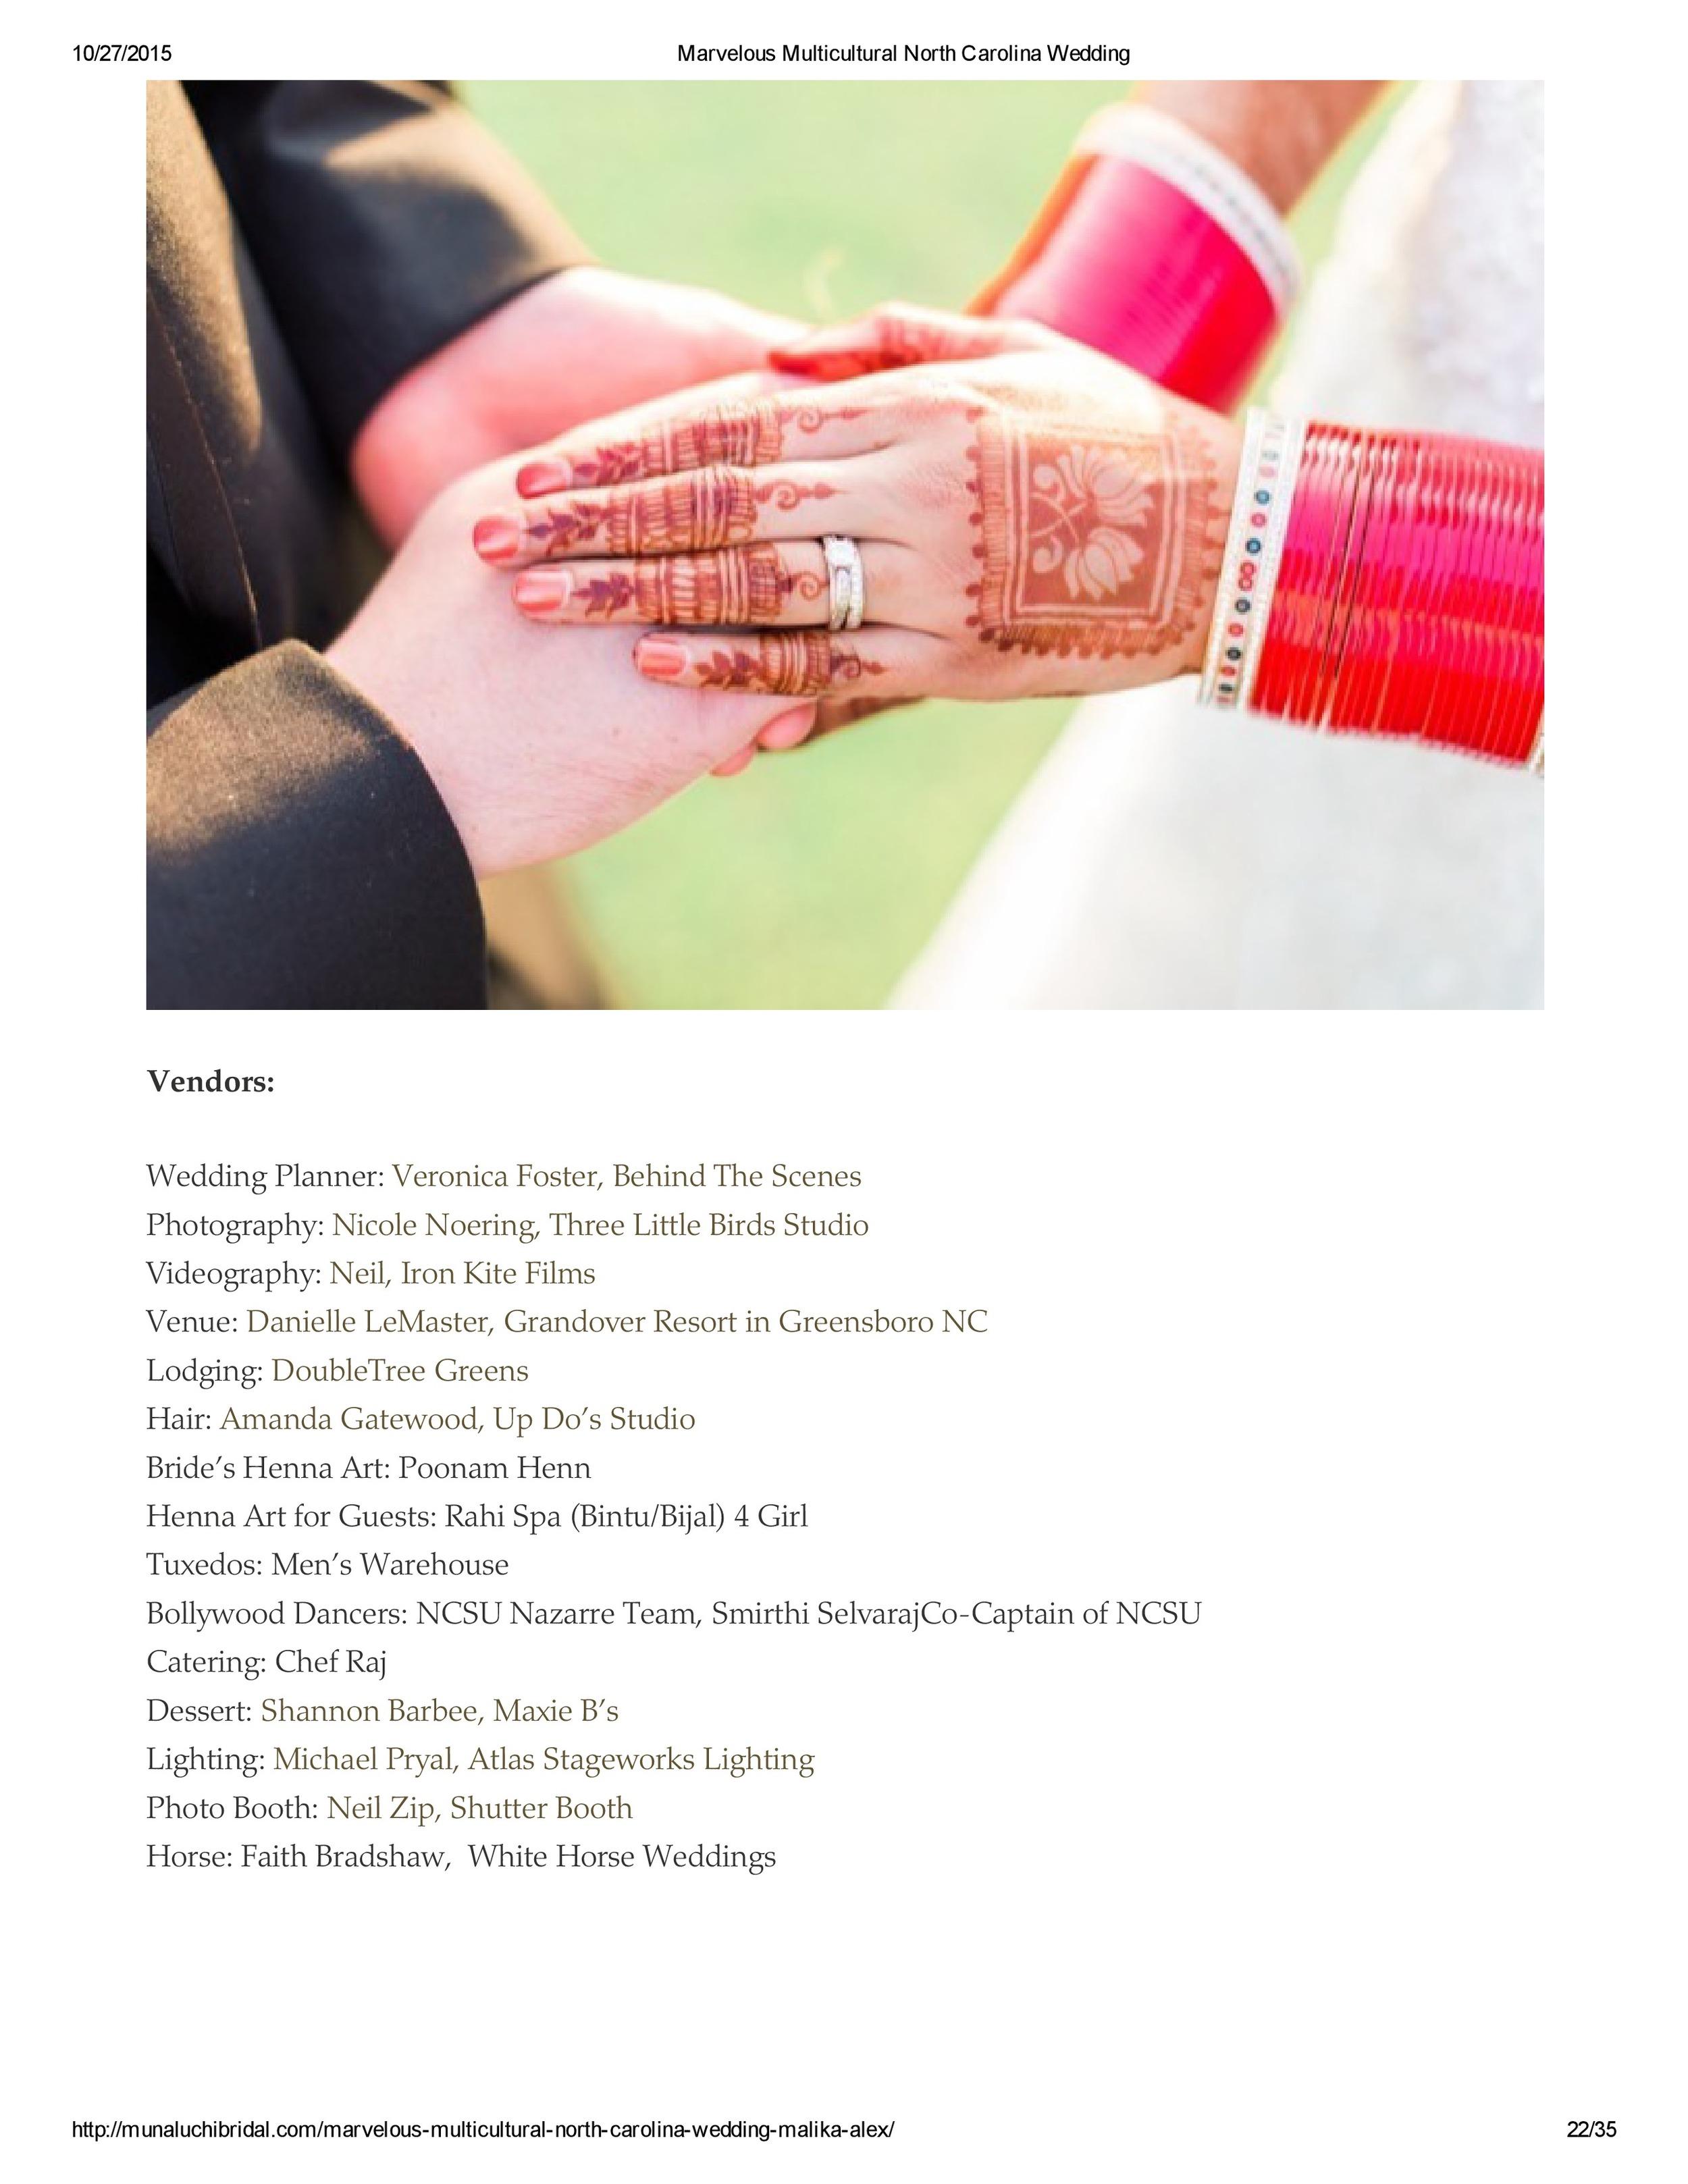 Marvelous Multicultural North Carolina Wedding - Alex & Malika-page-21.jpg